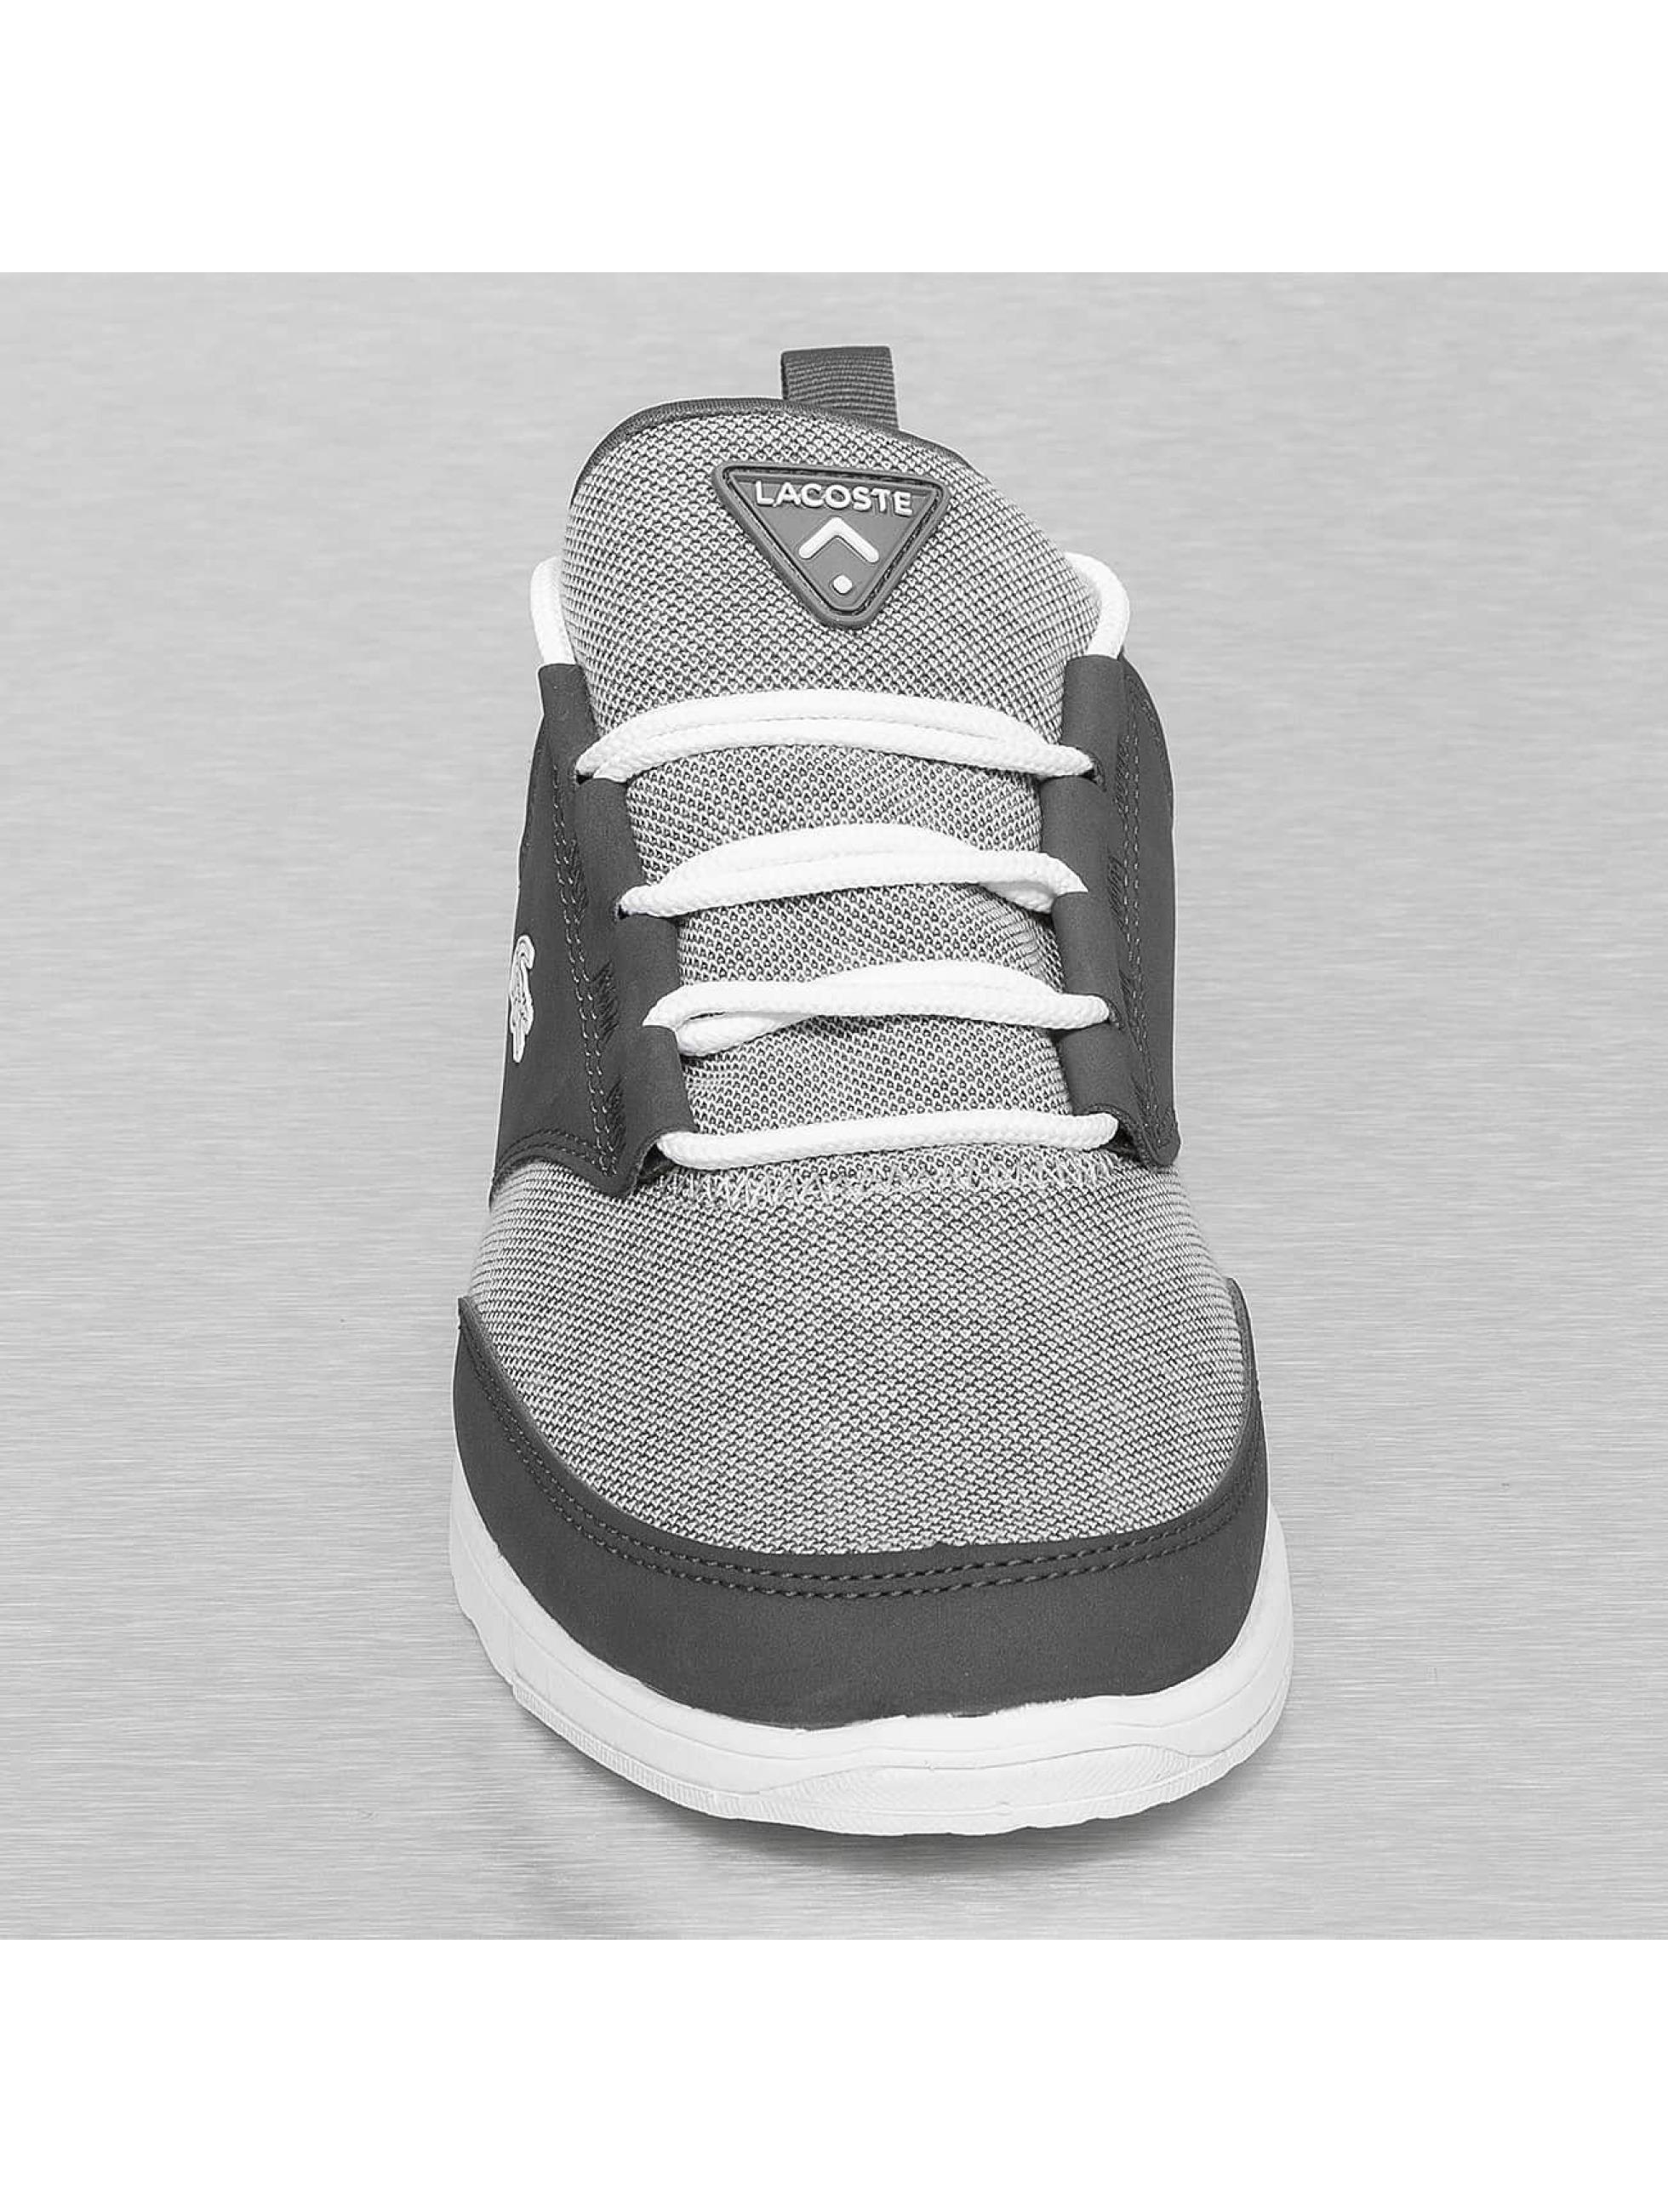 f8e8a3659b lacoste sneakers light femme| CADDZOOM